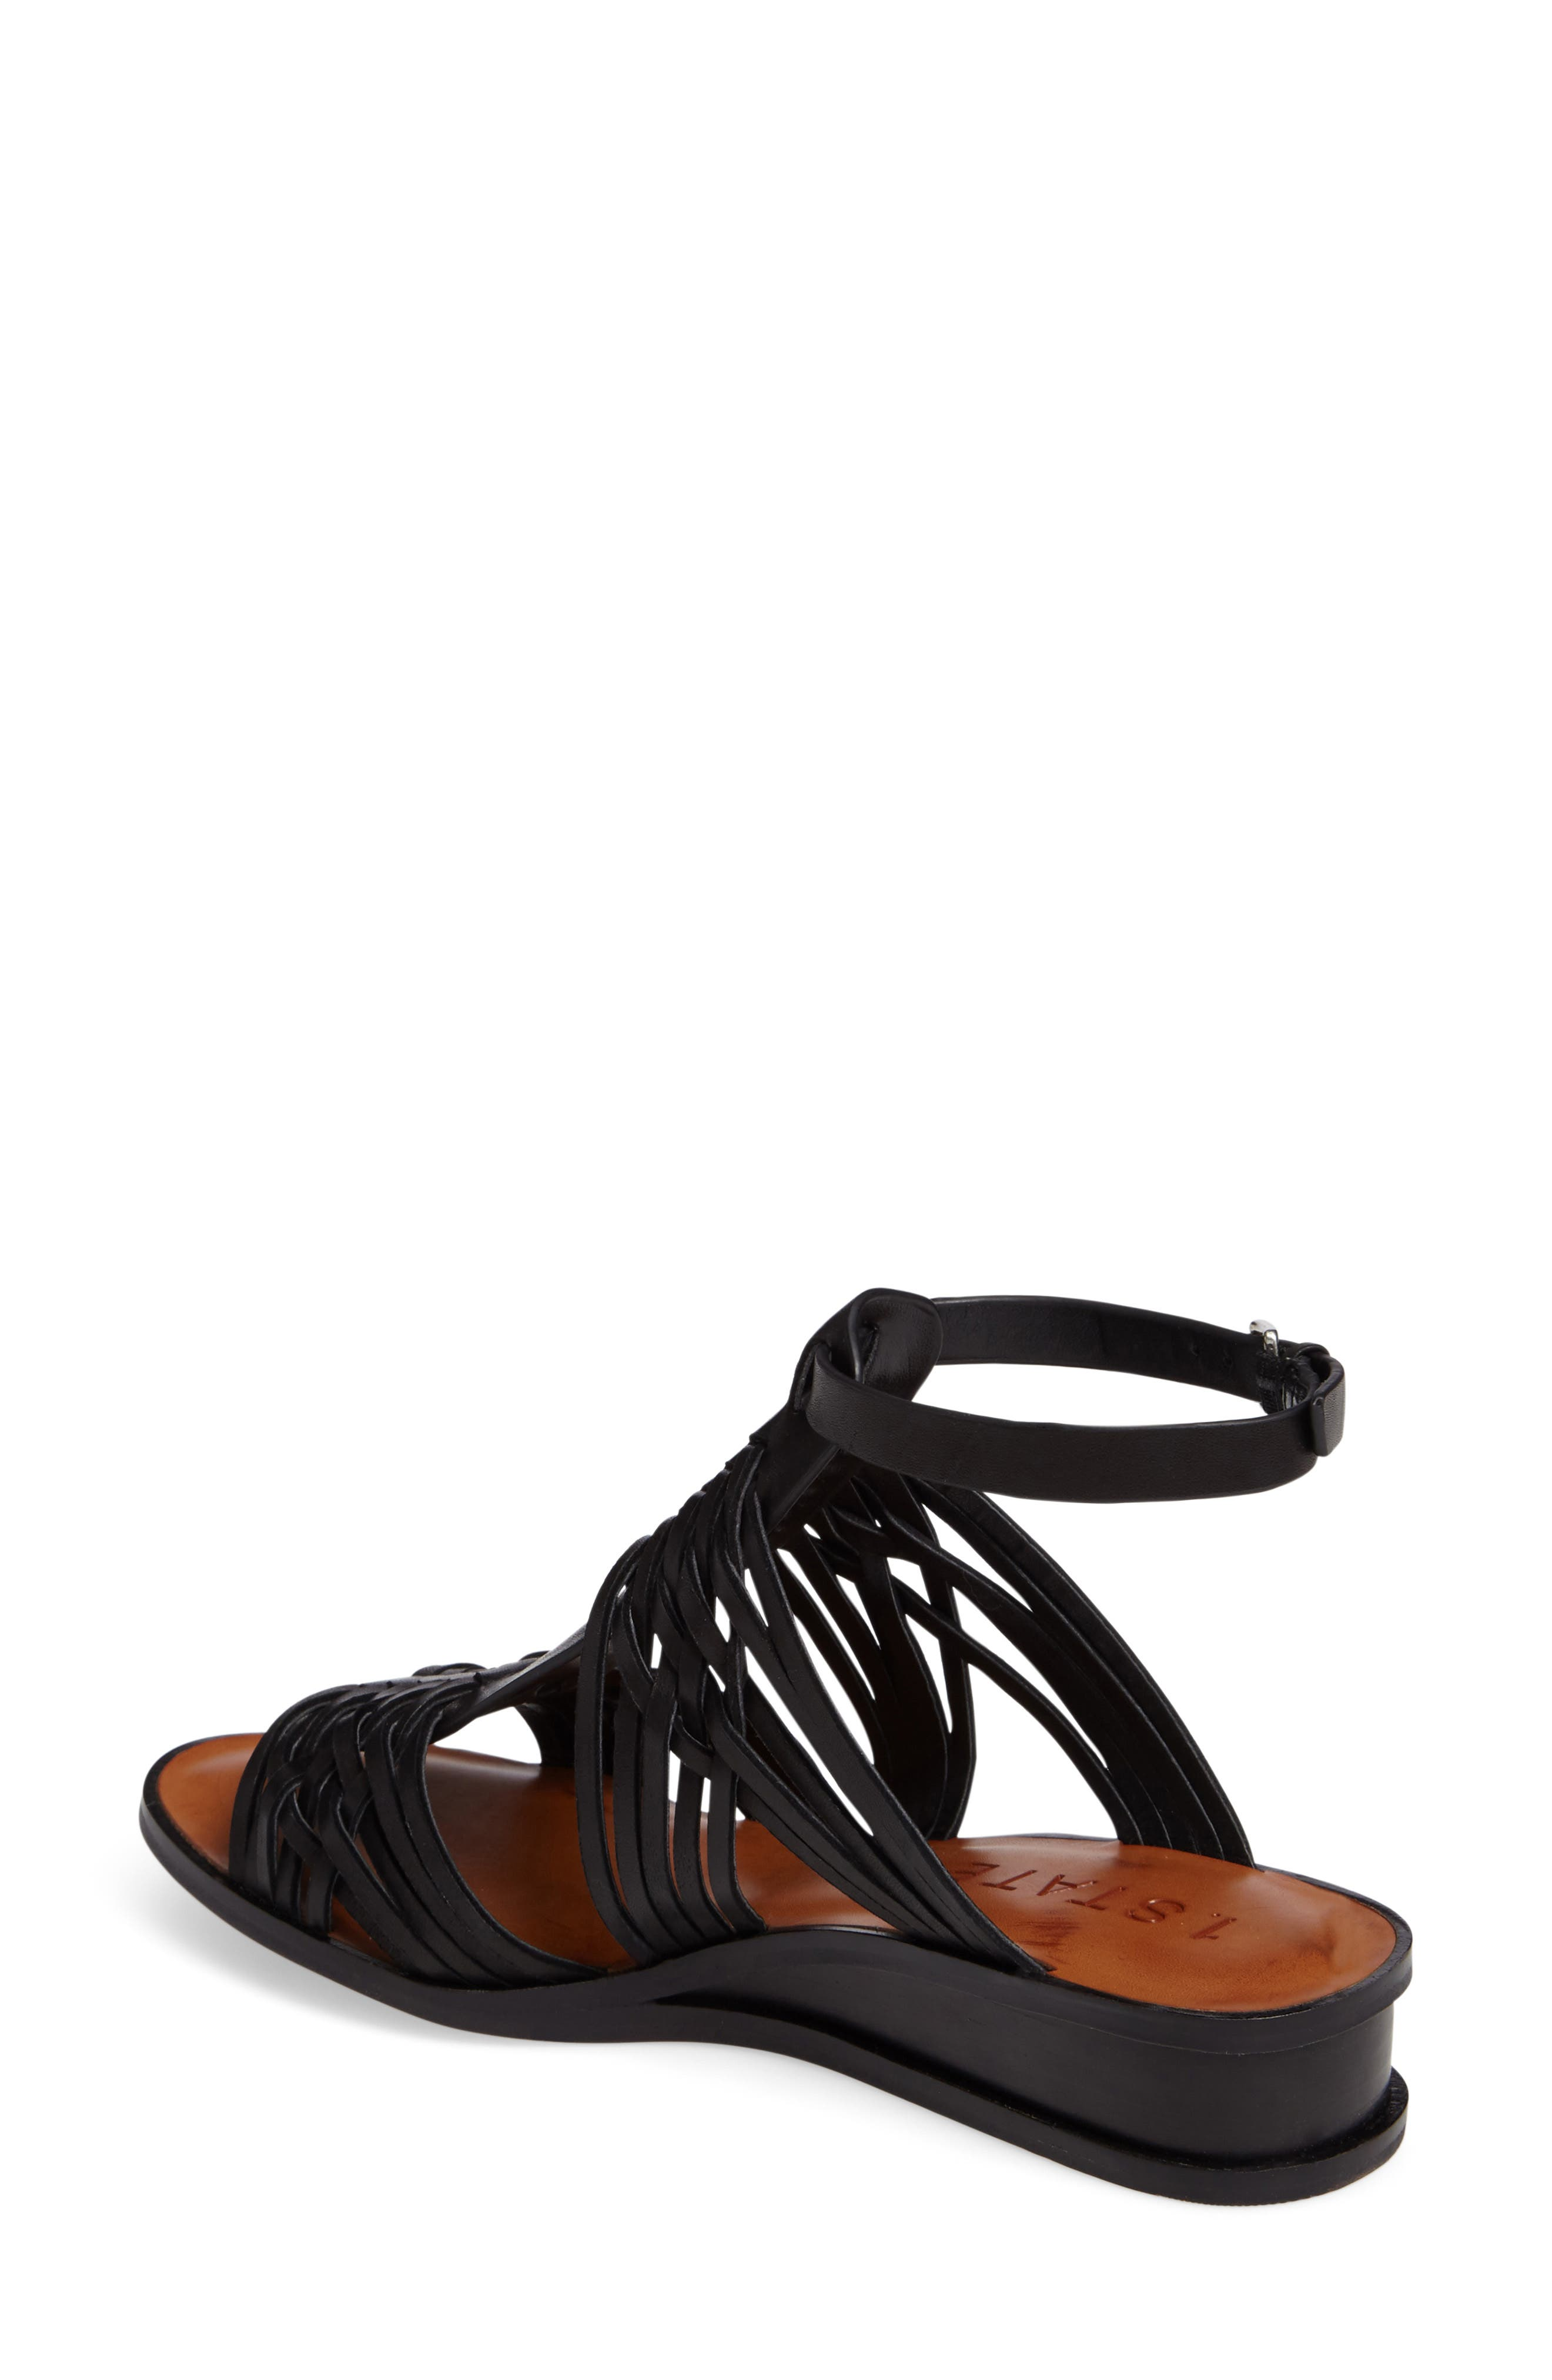 Maliyah Wedge Sandal,                             Alternate thumbnail 2, color,                             001